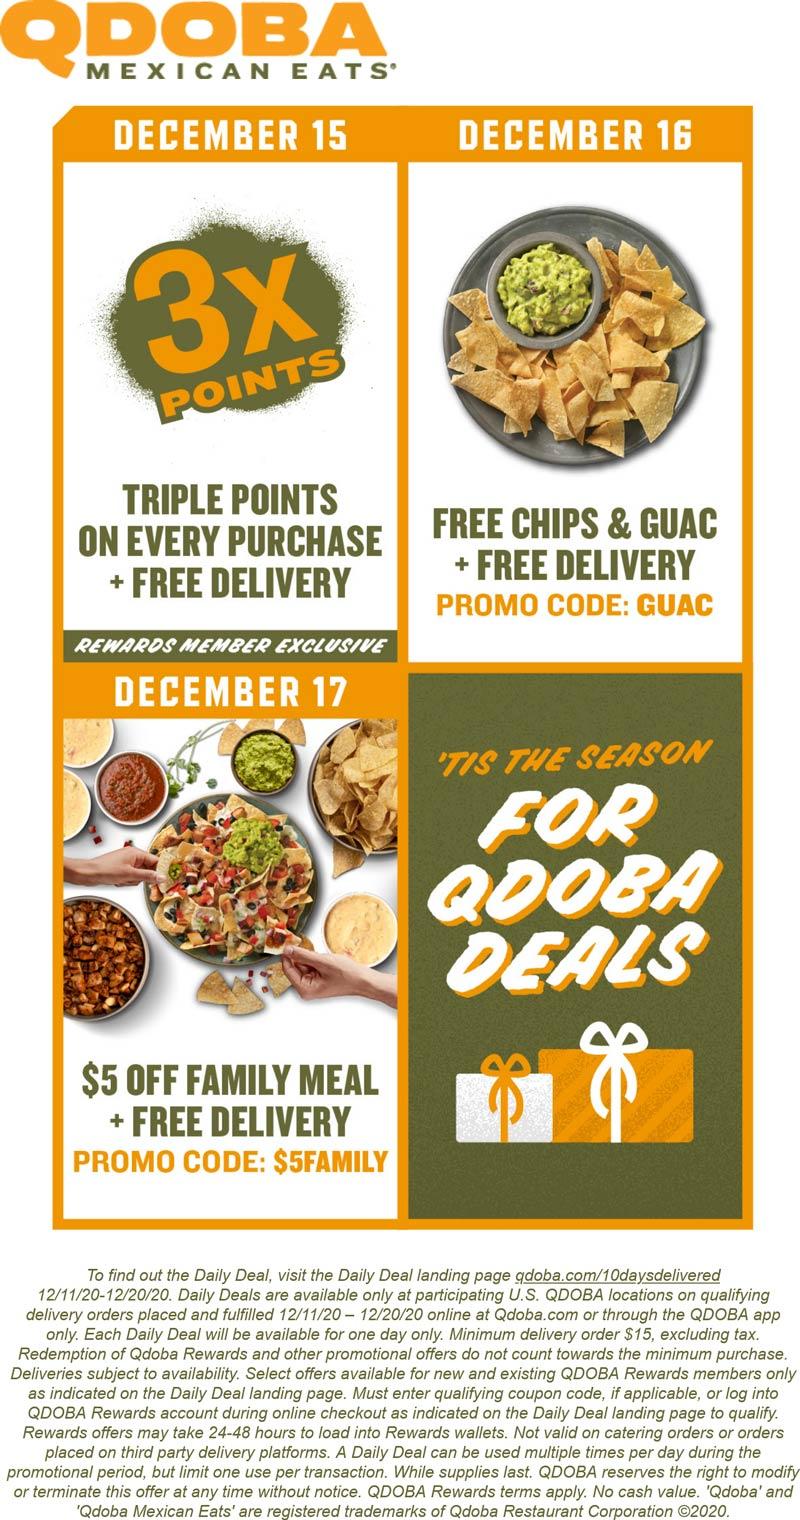 Qdoba restaurants Coupon  Free chips + guac + delivery Weds & $5 off family meal Thur at Qdoba via promo code GUAC & $5FAMILY #qdoba